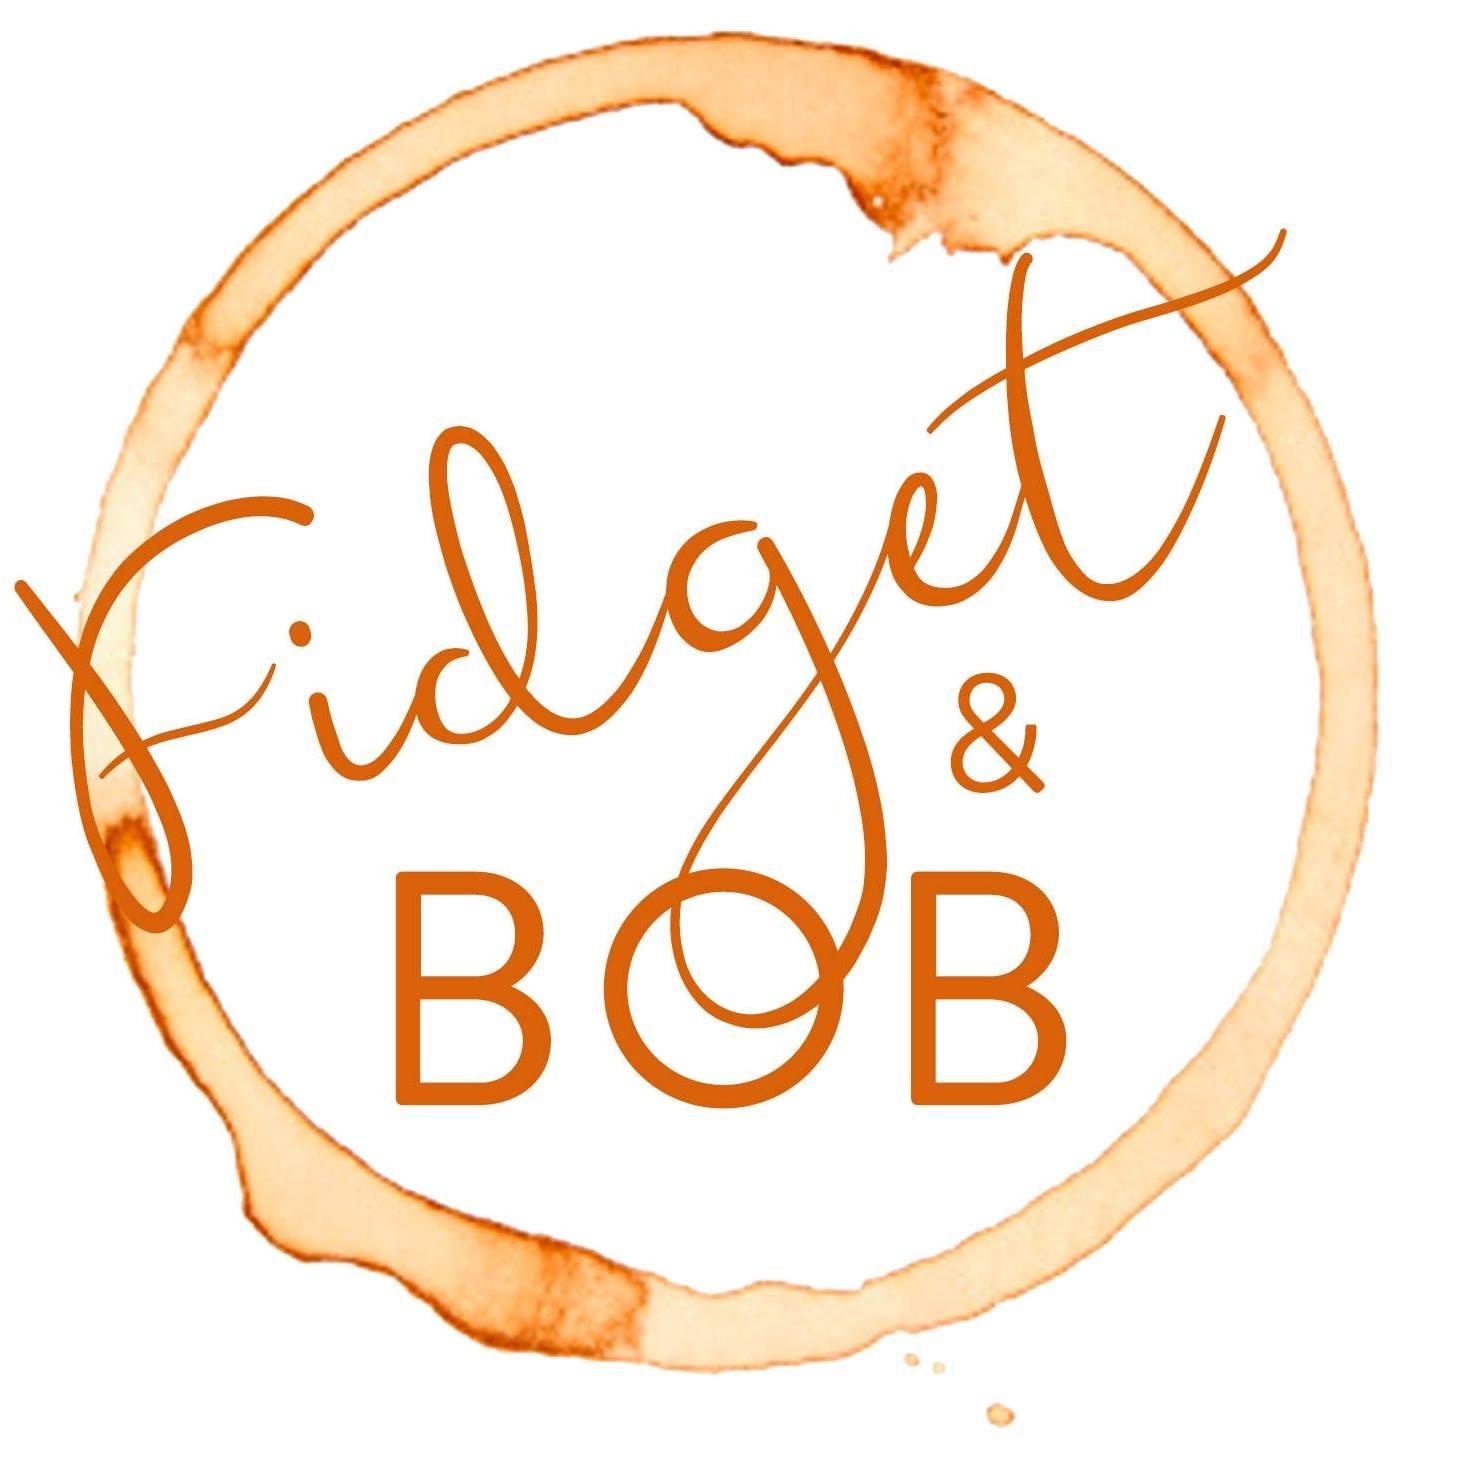 Fidget & Bob